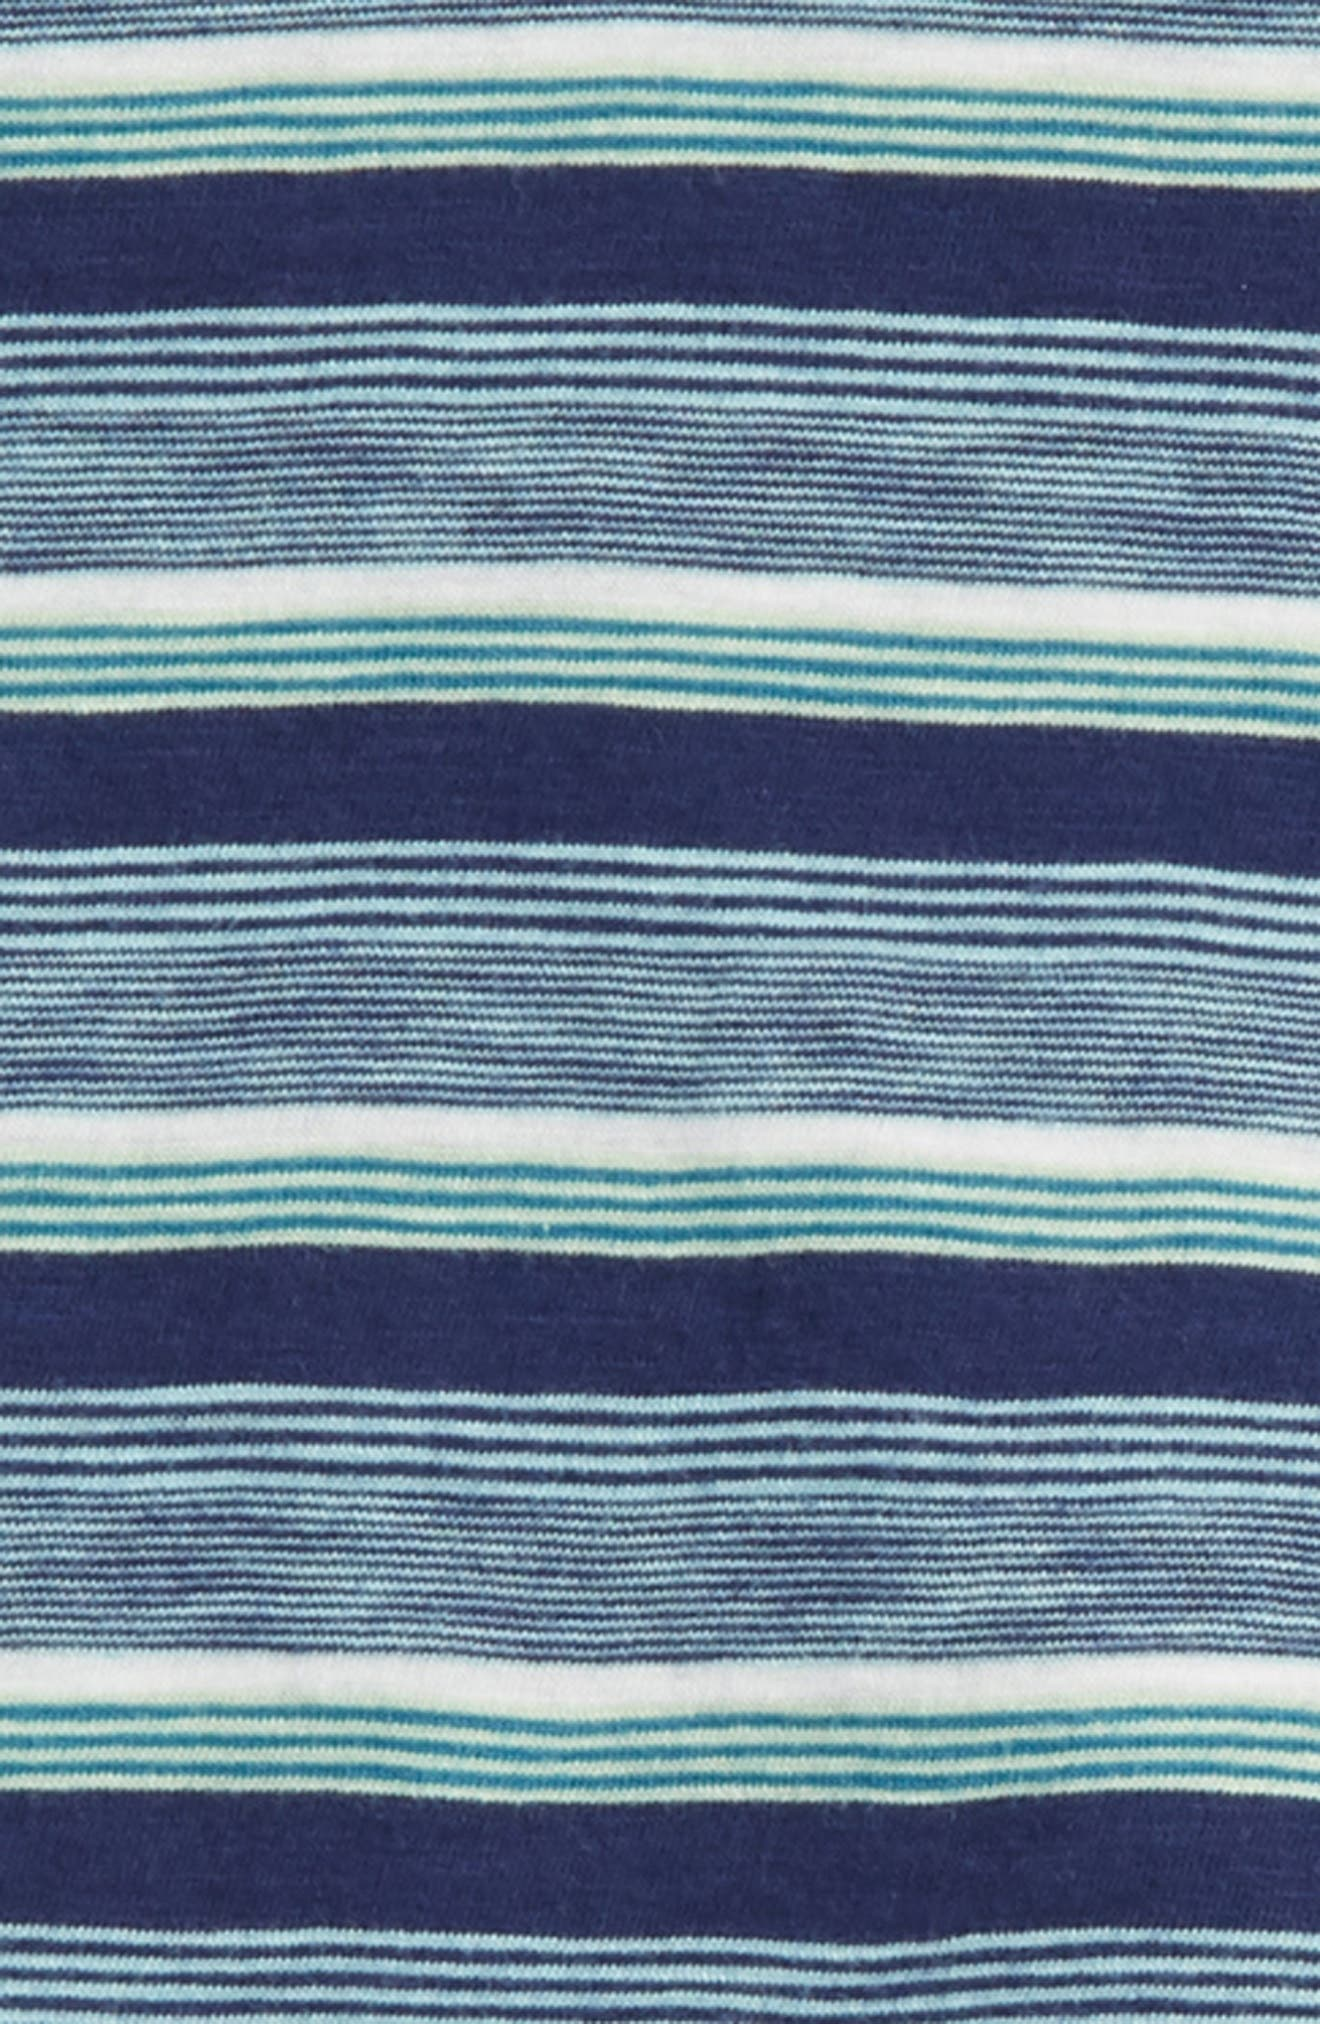 V-Neck T-Shirt & Shorts Set,                             Alternate thumbnail 2, color,                             Indigo Sky